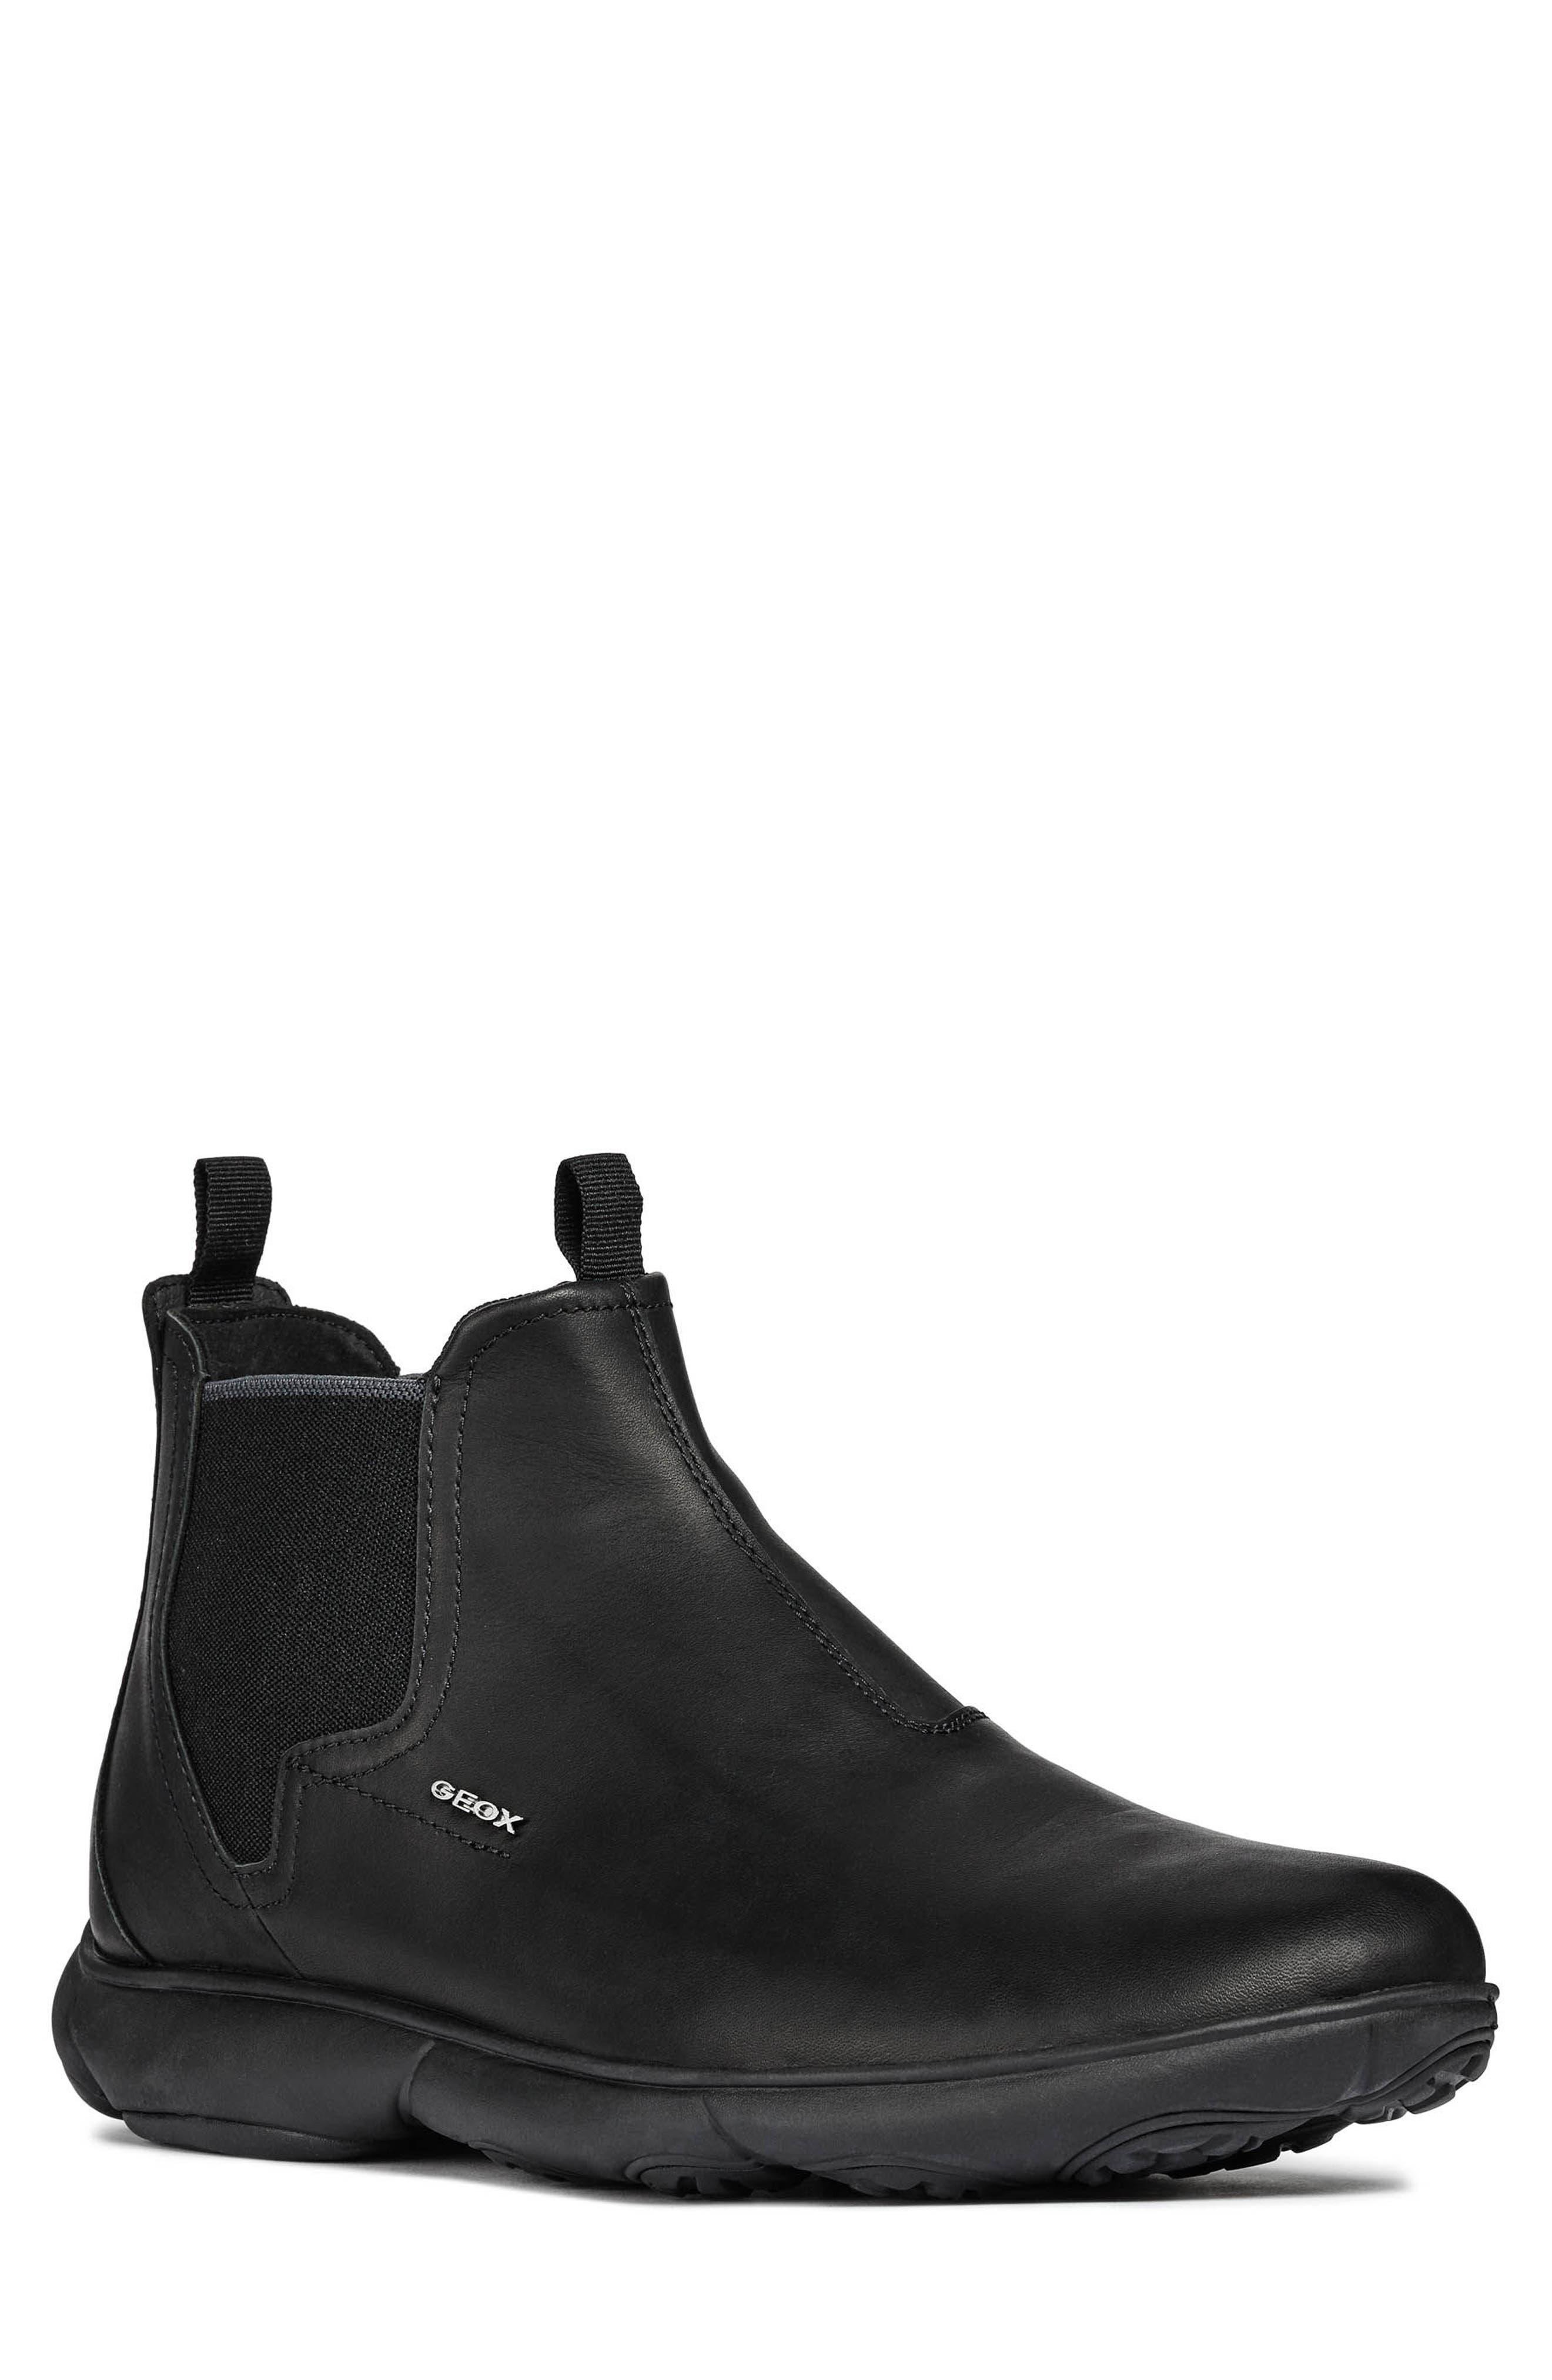 Nebula Mid Chelsea Sneaker,                             Main thumbnail 1, color,                             BLACK LEATHER